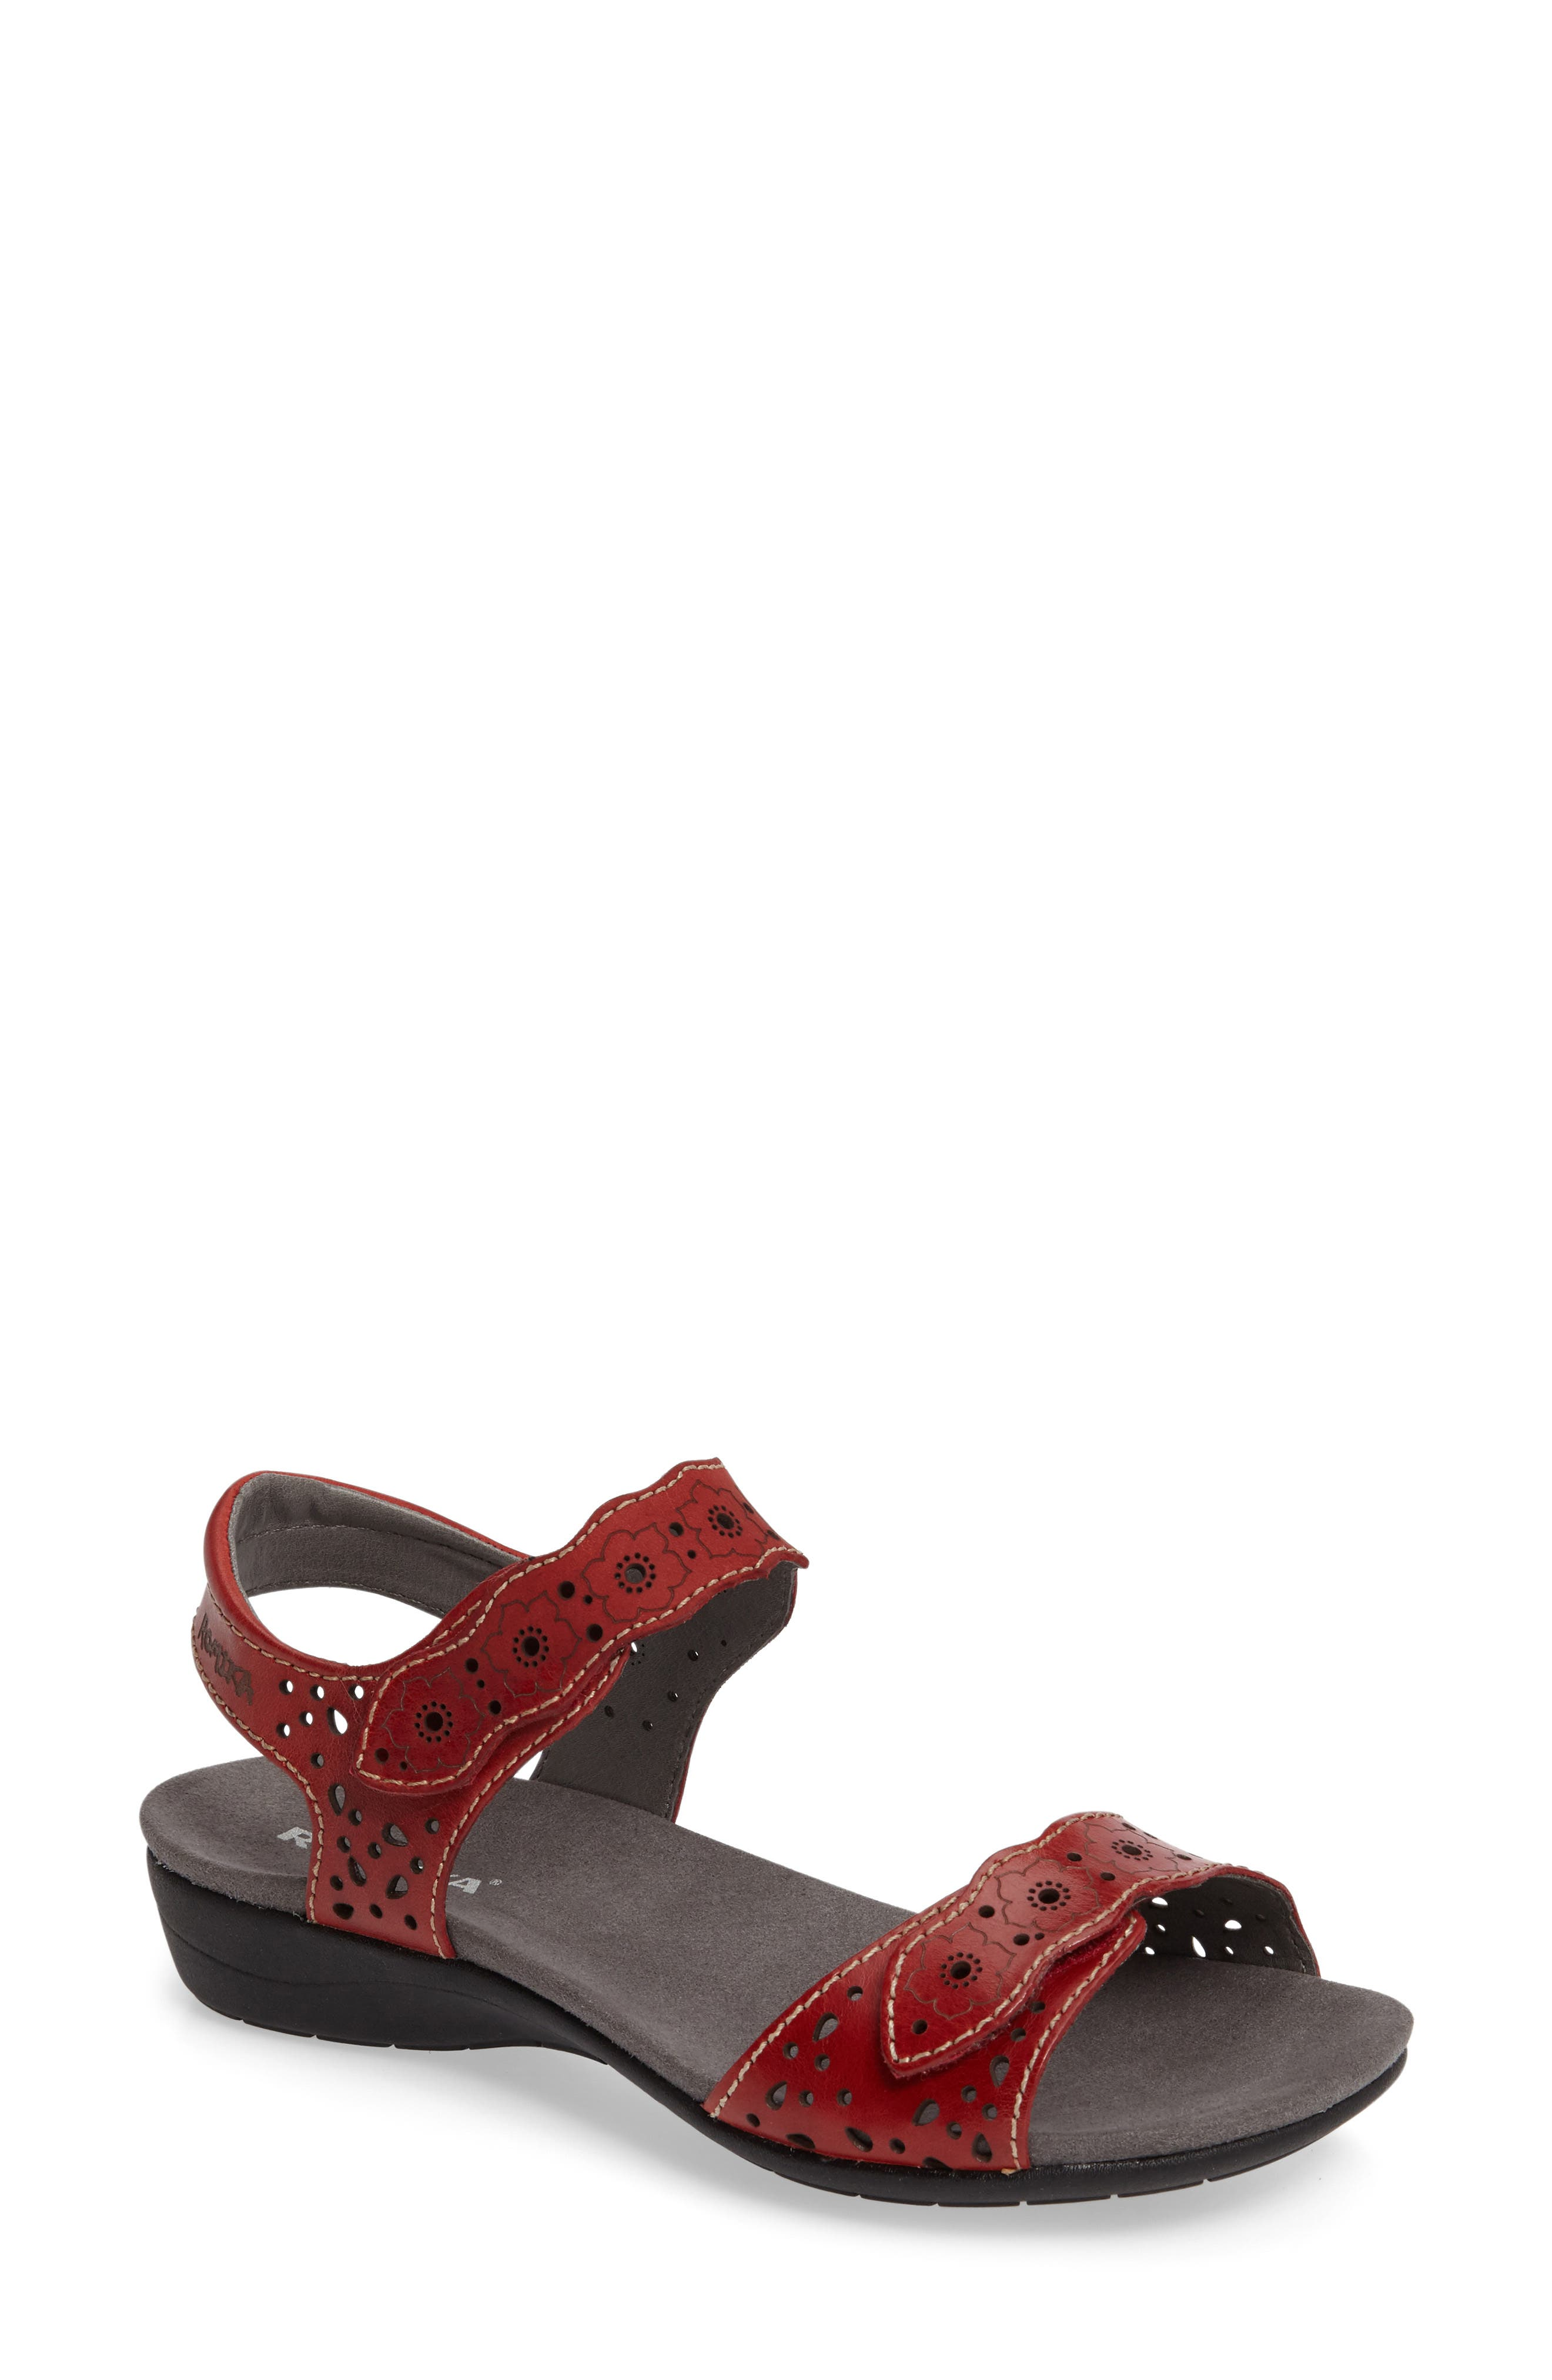 Alternate Image 1 Selected - Romika® 'Tahiti 03' Quarter Strap Sandal (Women)